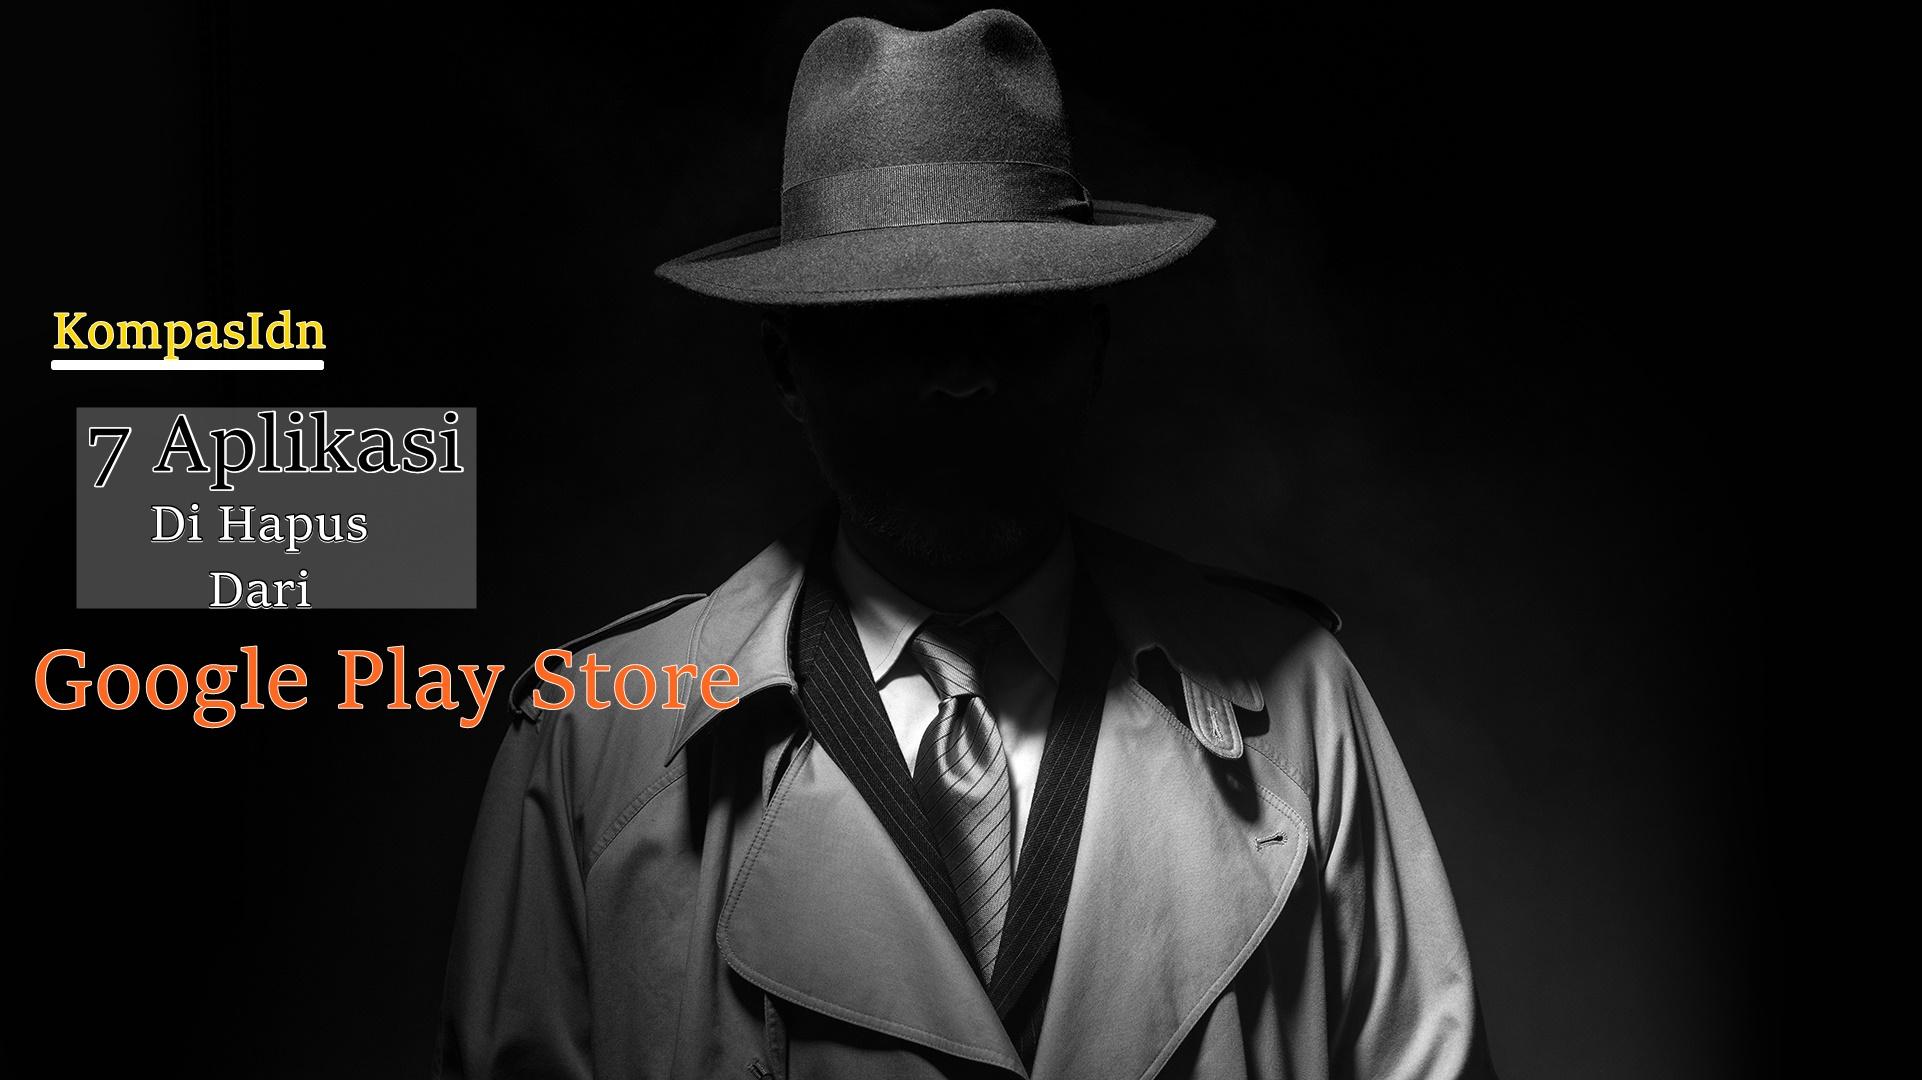 7 Aplikasi Spy yang Di Hapus Google Play Store